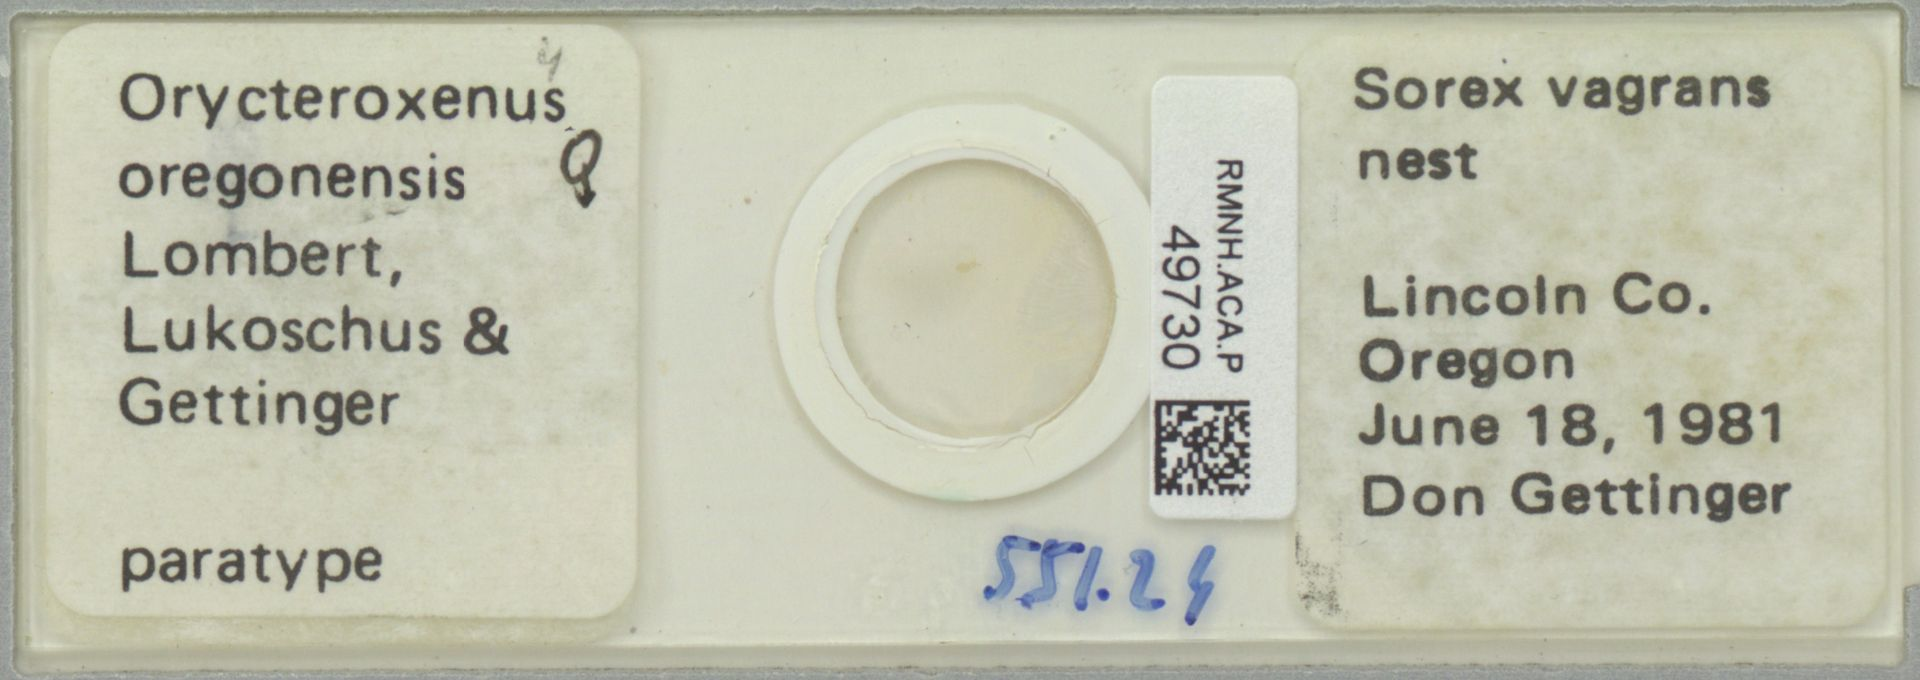 RMNH.ACA.P.49730   Orycteroxenus oregonensis Lombert, Lukoschus & Gettinger